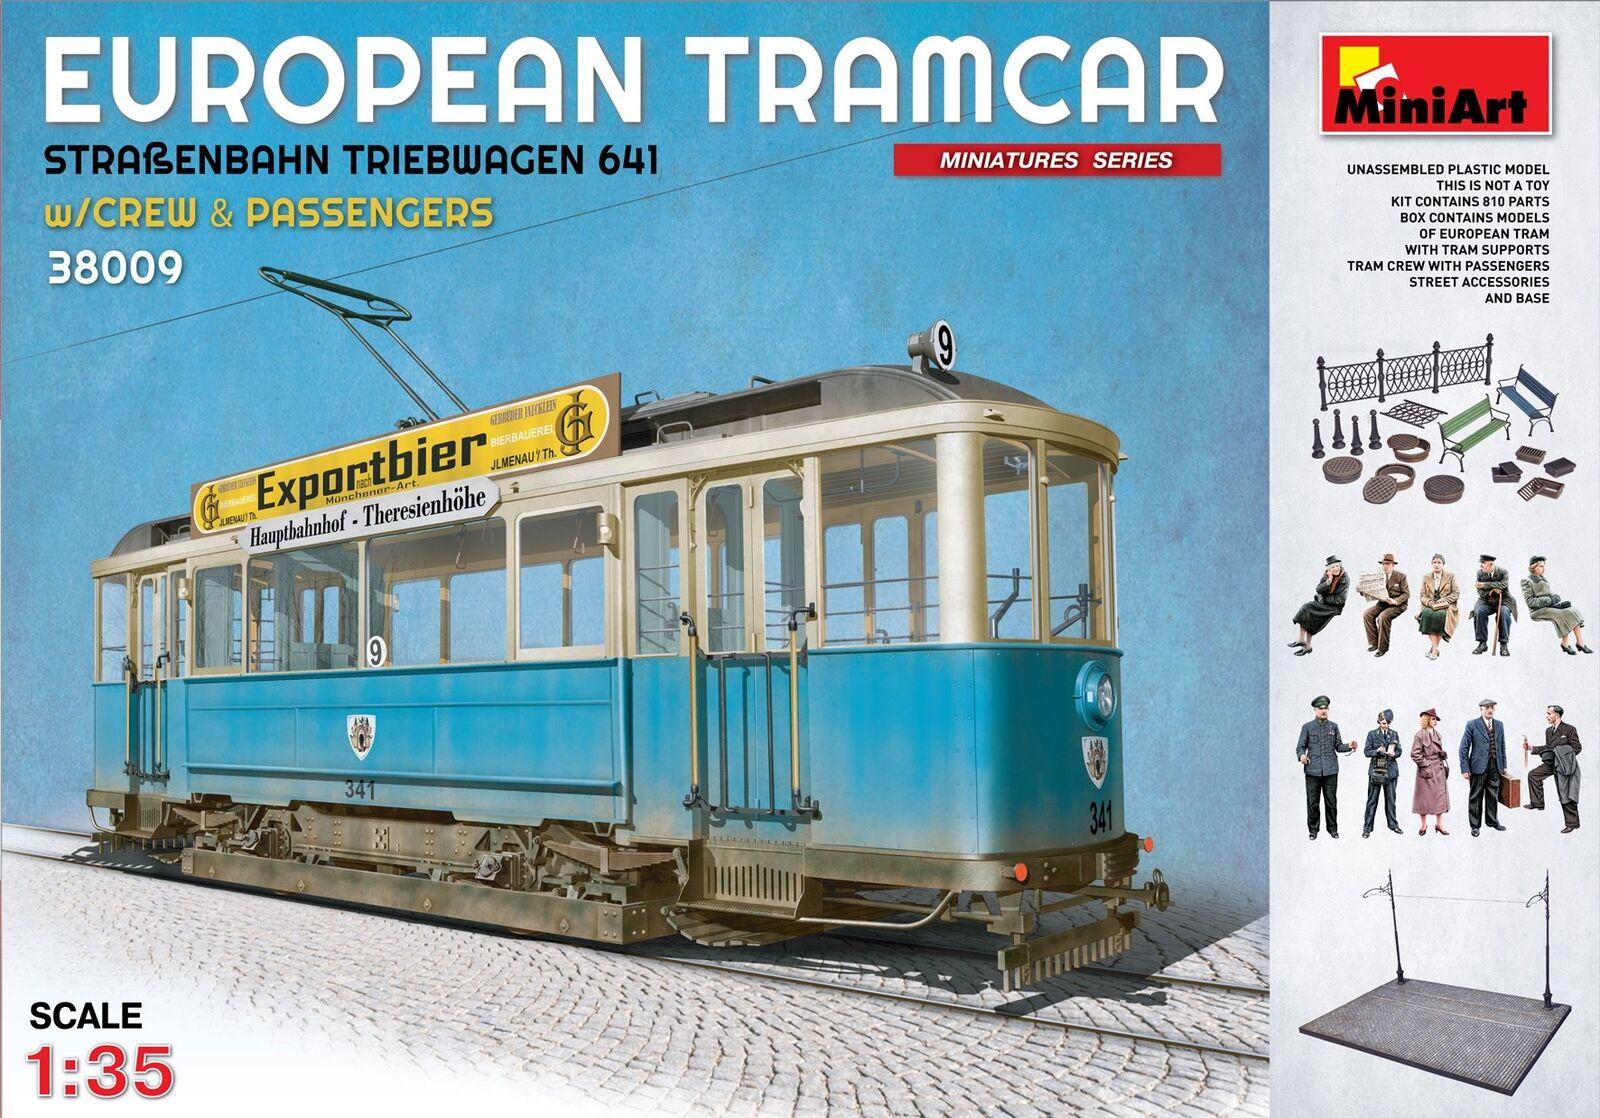 European Tram W Crew And Accessories  Kit Miniart 1 35 MIN38009  vente chaude en ligne